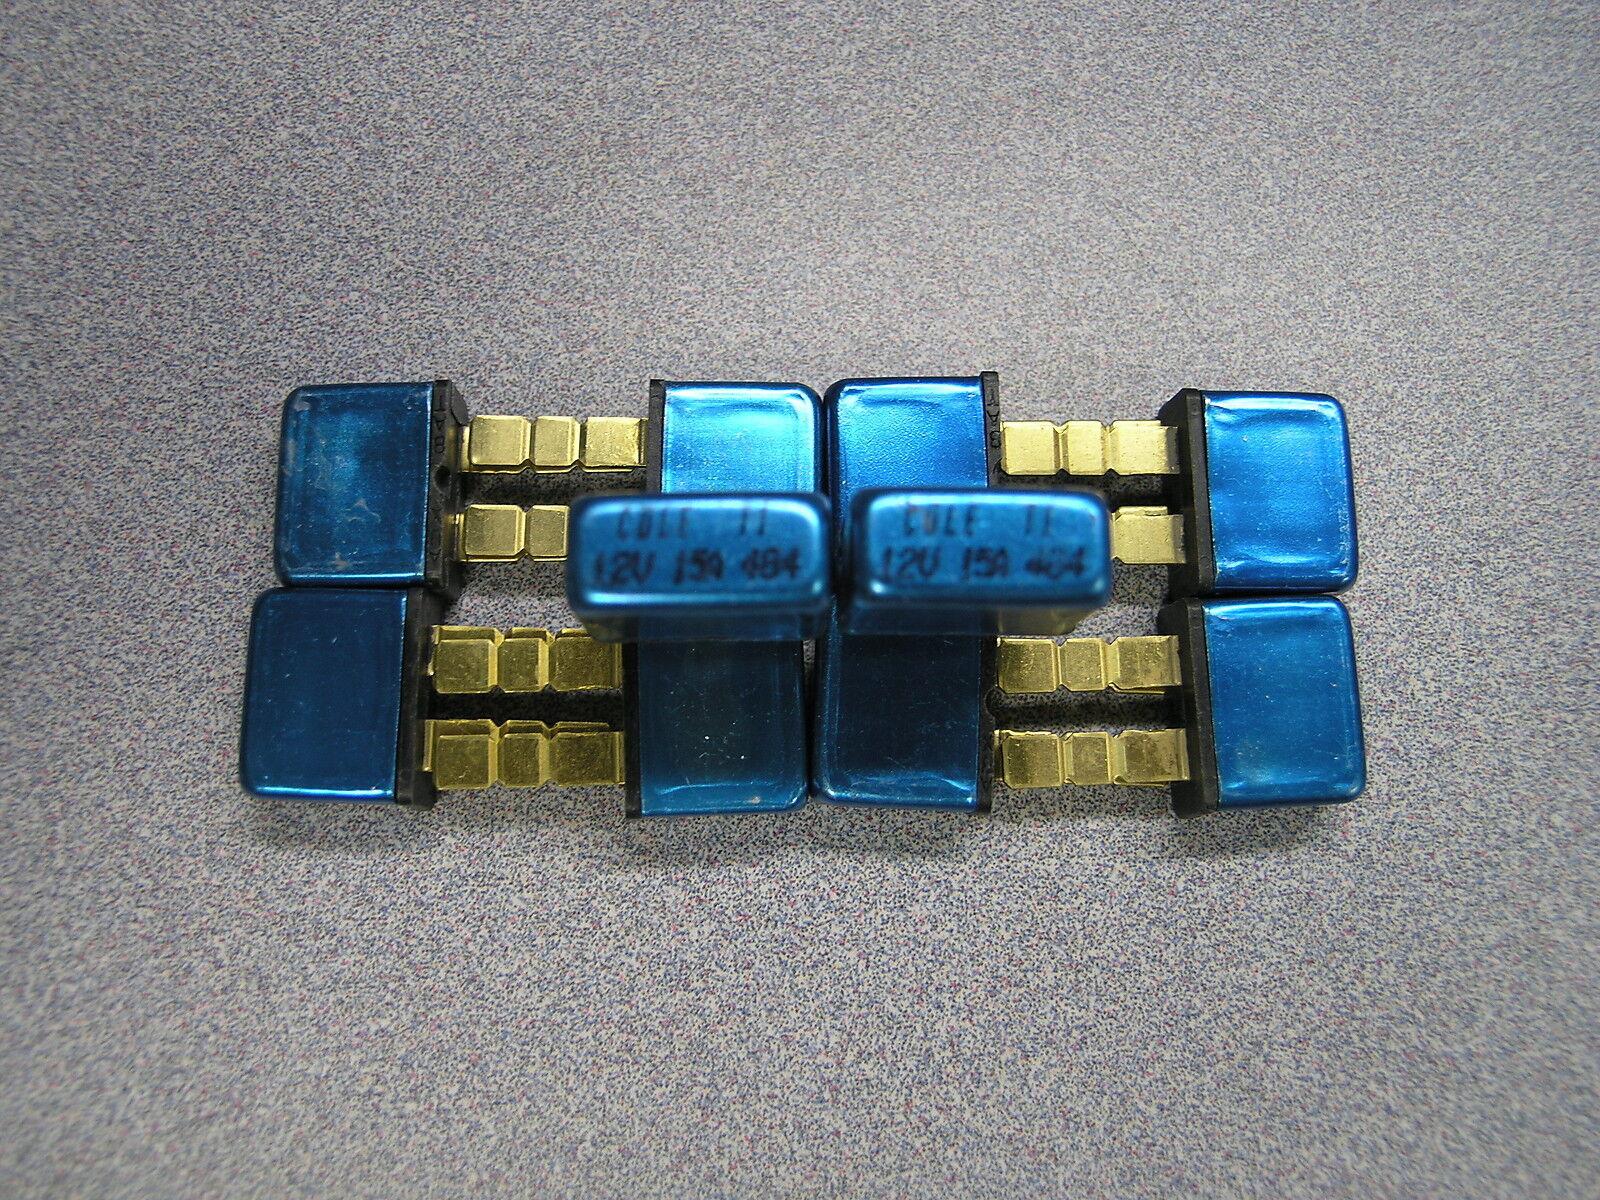 ARNO VCGT 220530FN-ALU New Carbide Inserts Grade AK10 10pcs AJ